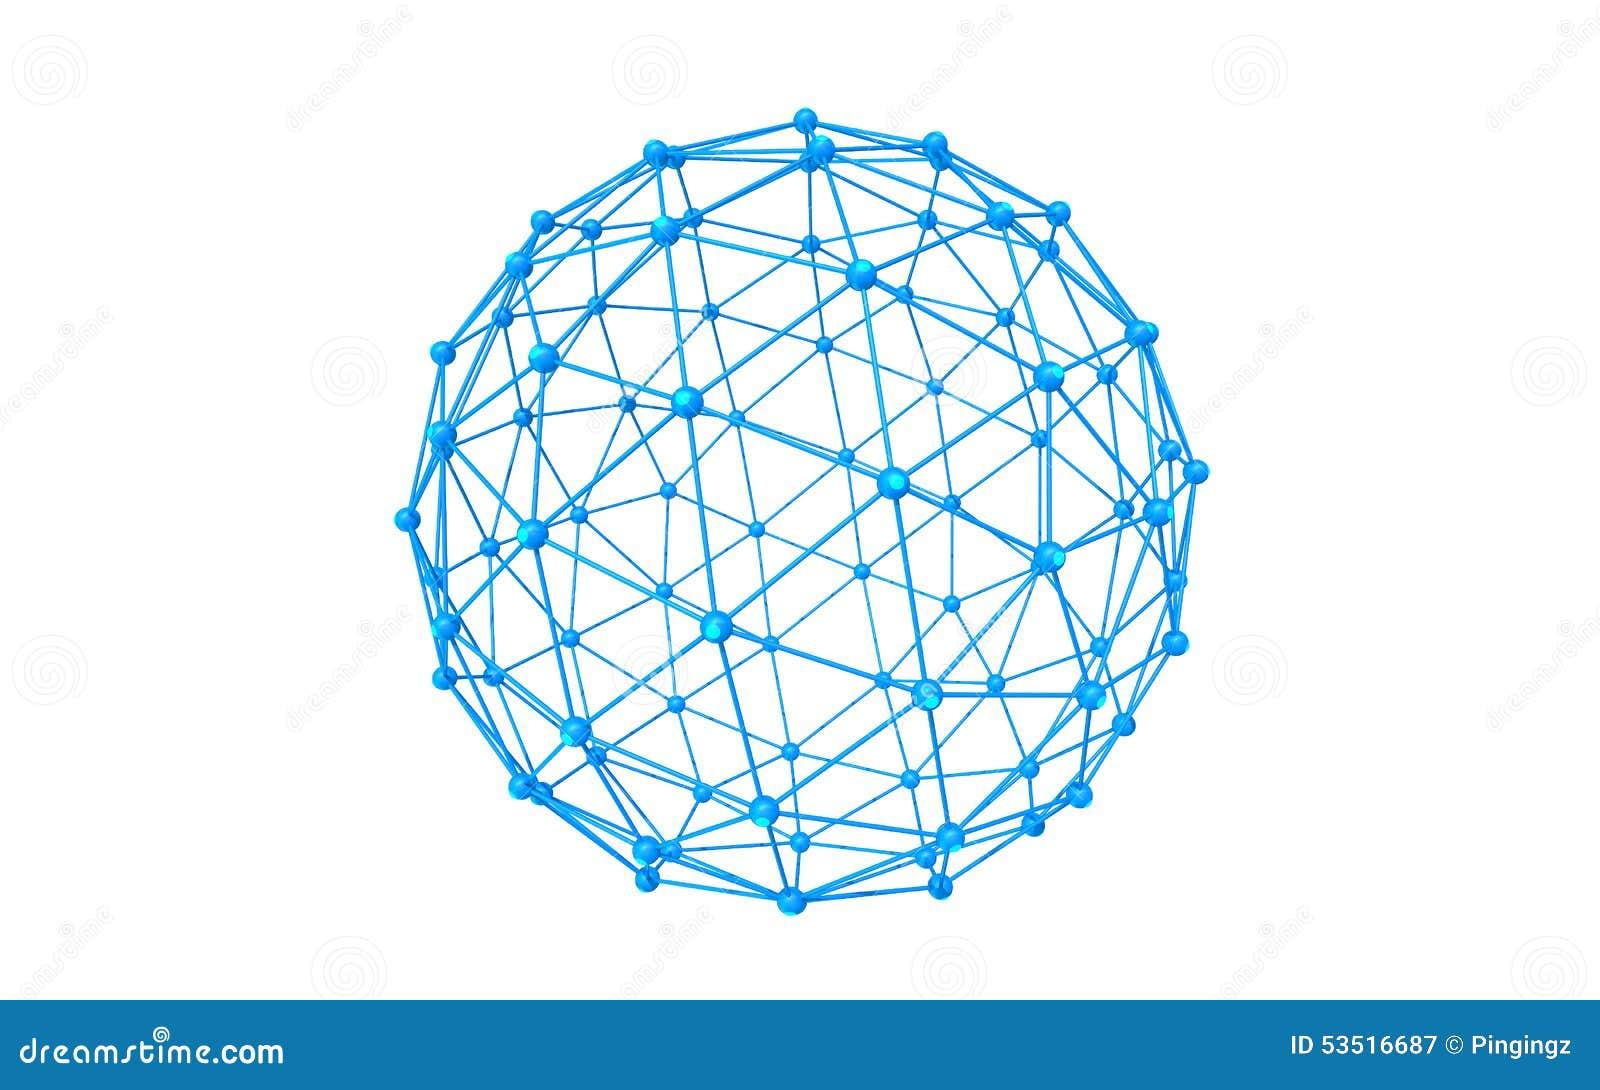 Global network icon blue illustration , white background.